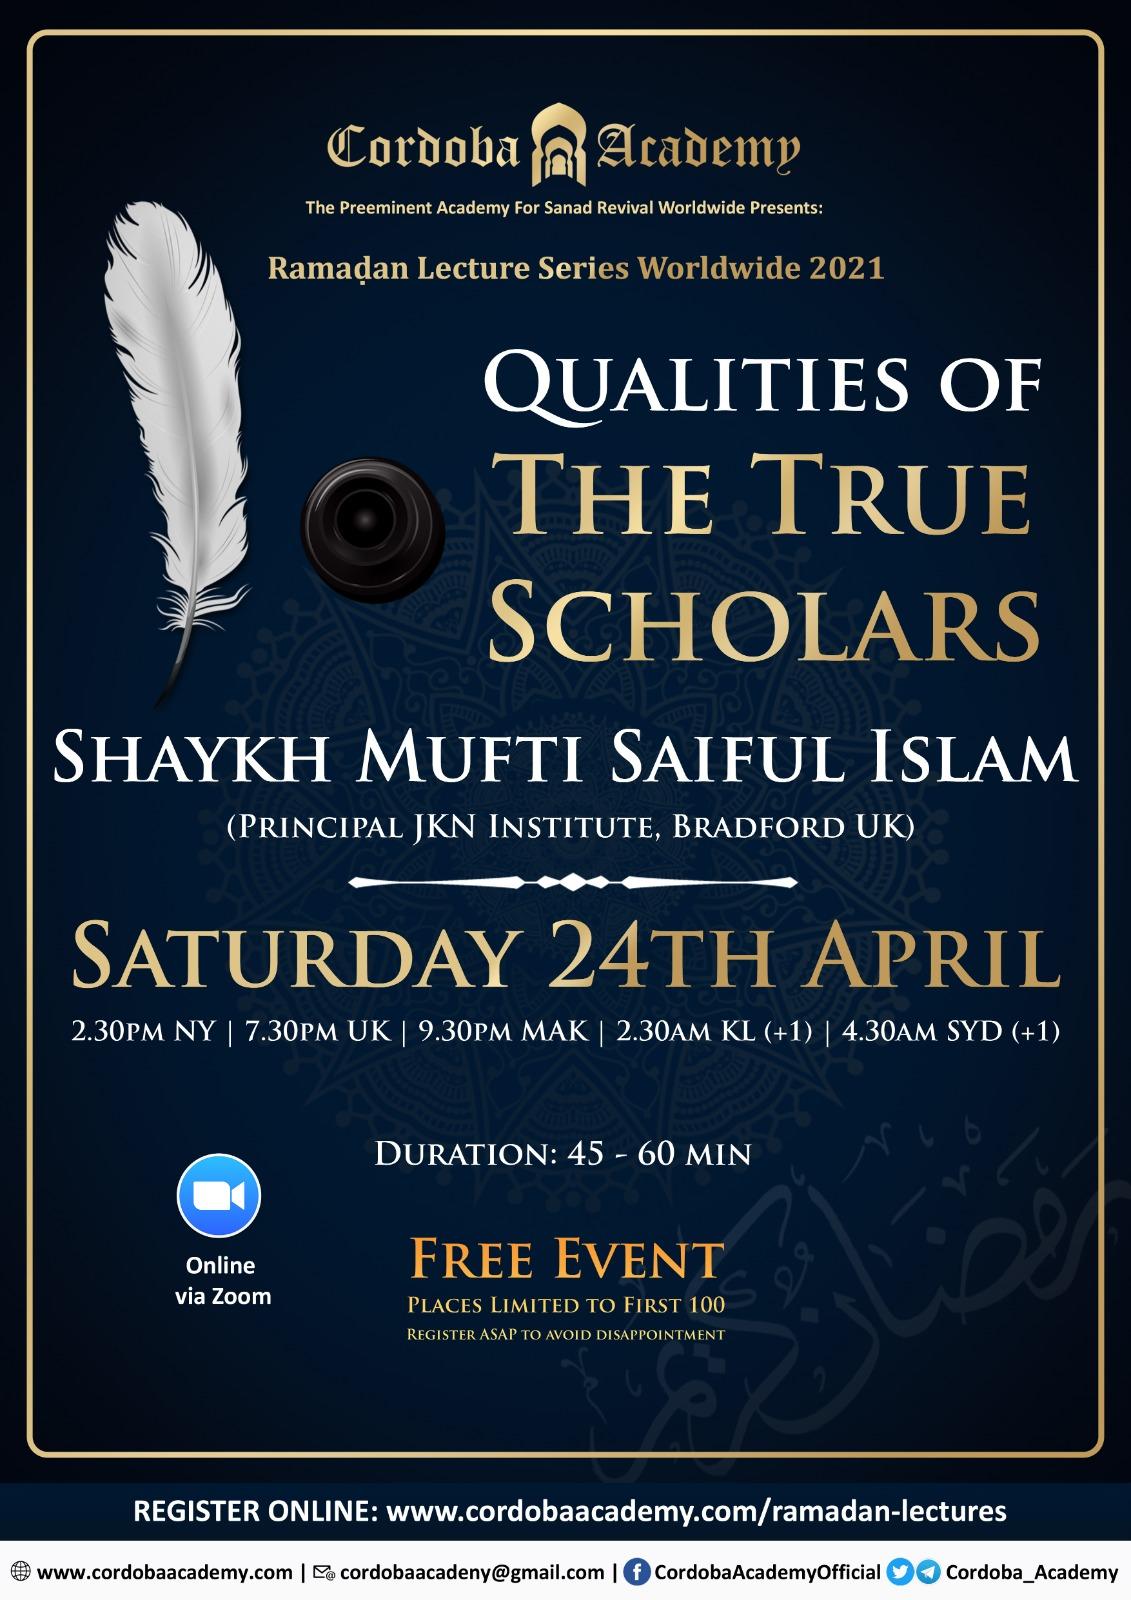 Shaykh Mufti Saiful Islam